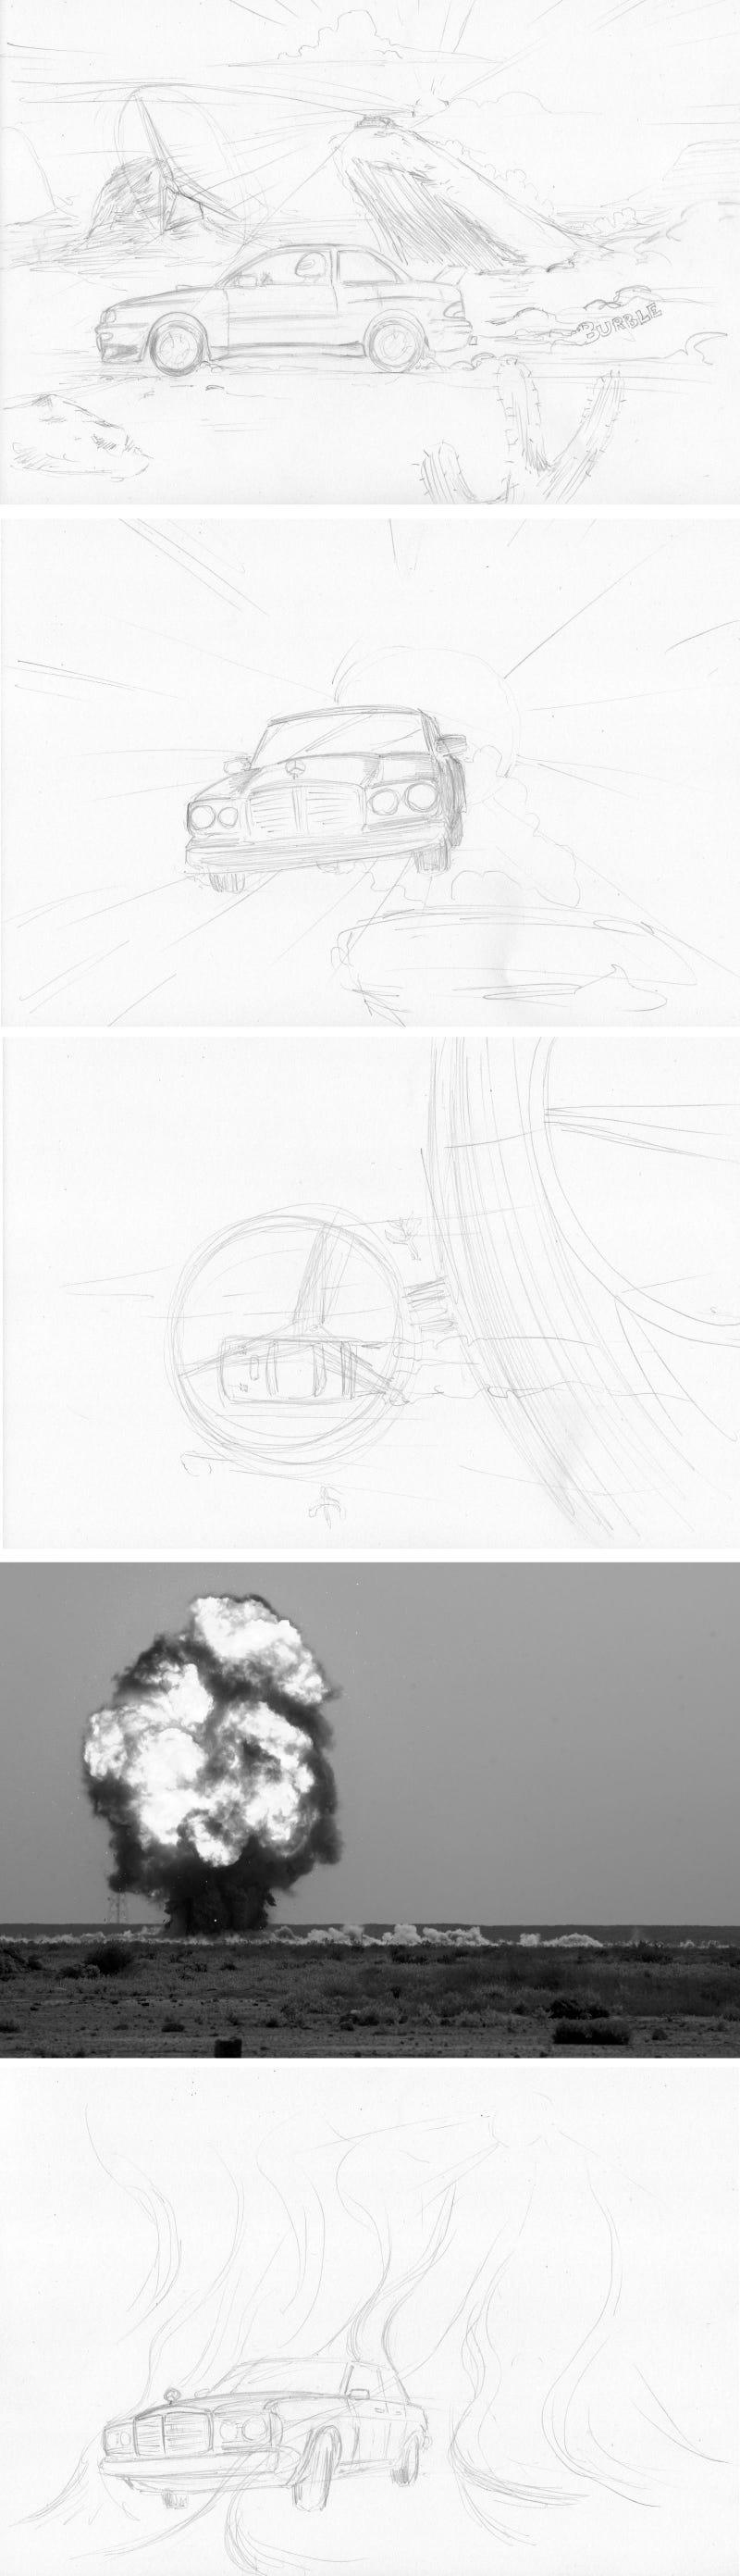 Illustration for article titled I Made a Comic: W123 vs 93-01 Impreza